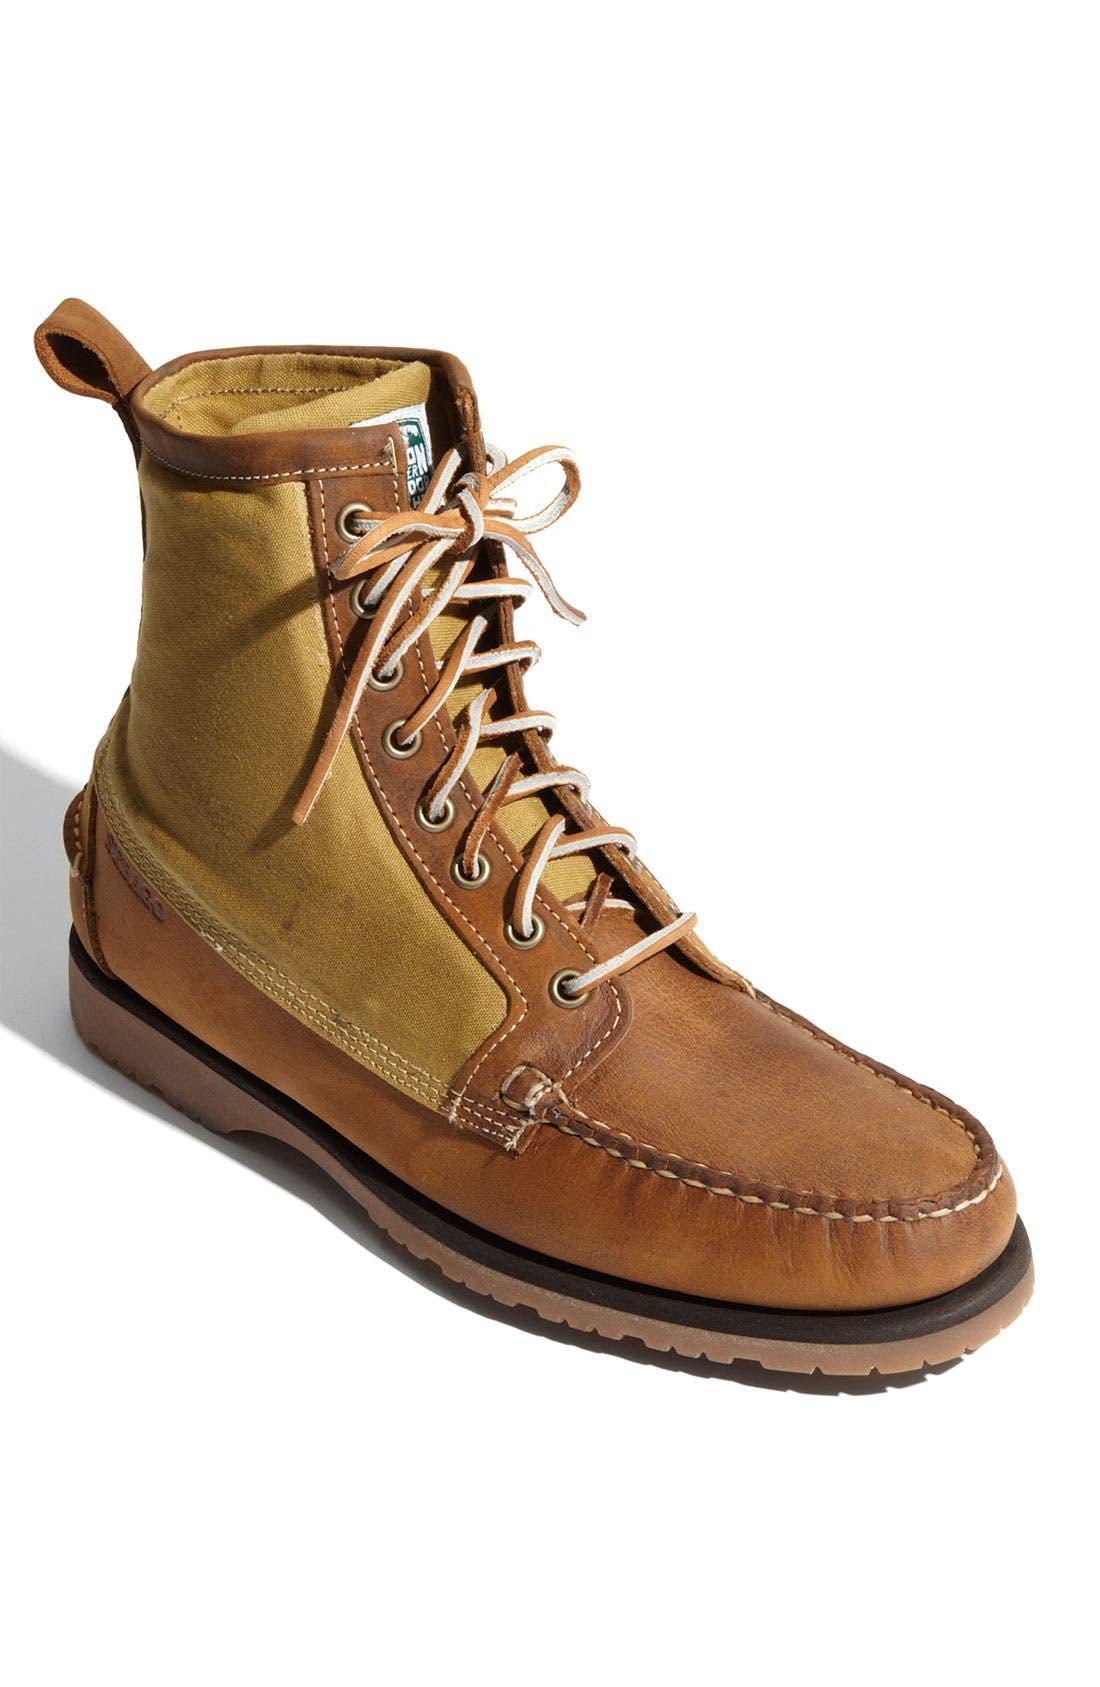 Alternate Image 1 Selected - Sebago 'Kettle' Boot